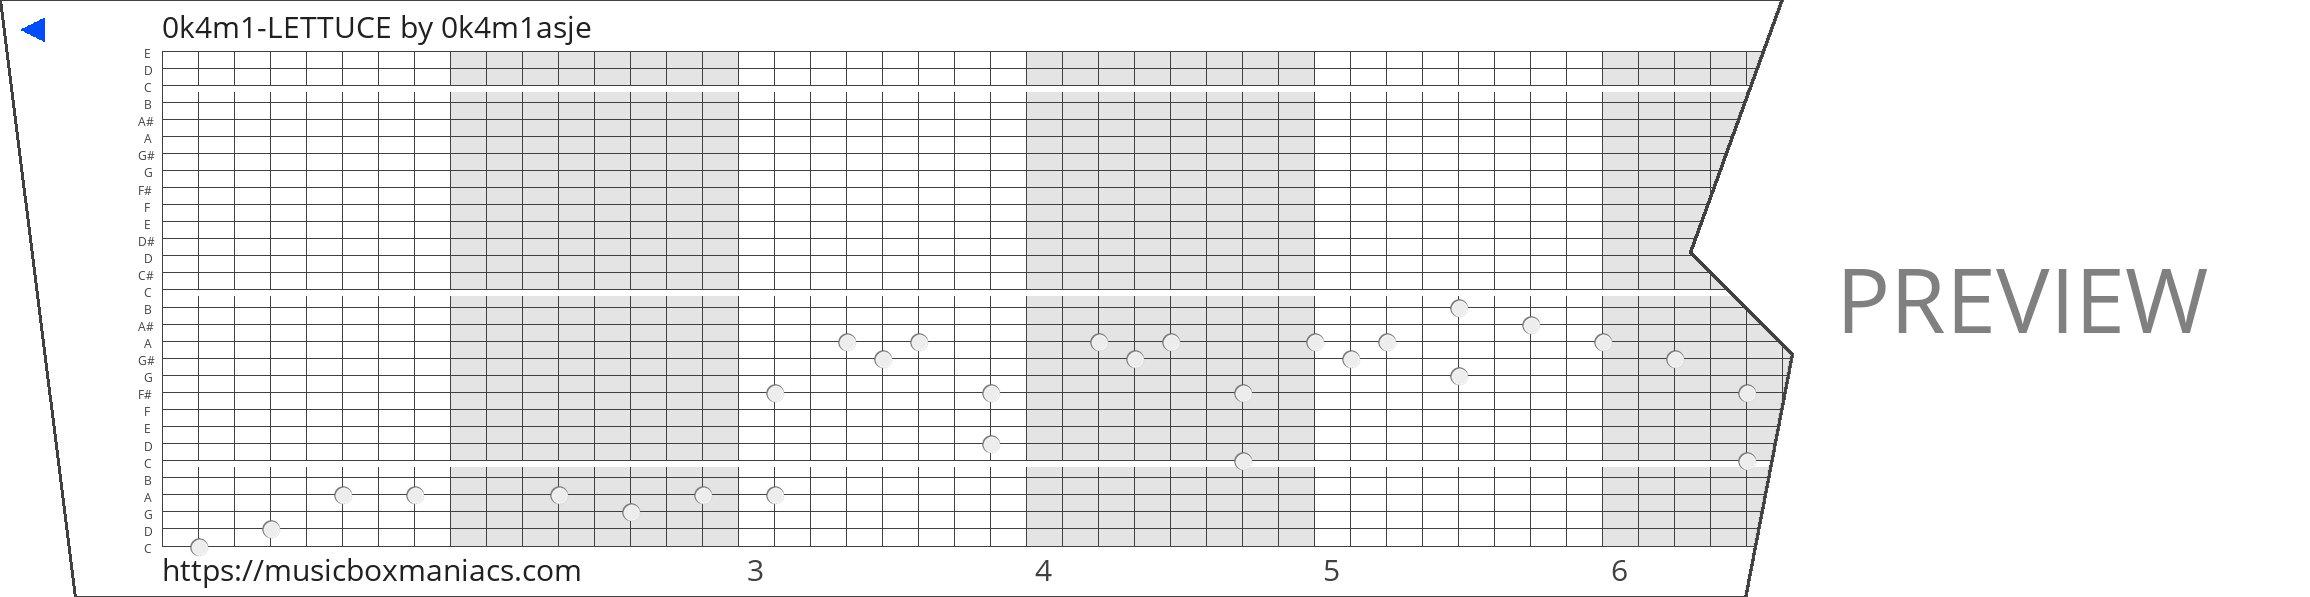 0k4m1-LETTUCE 30 note music box paper strip